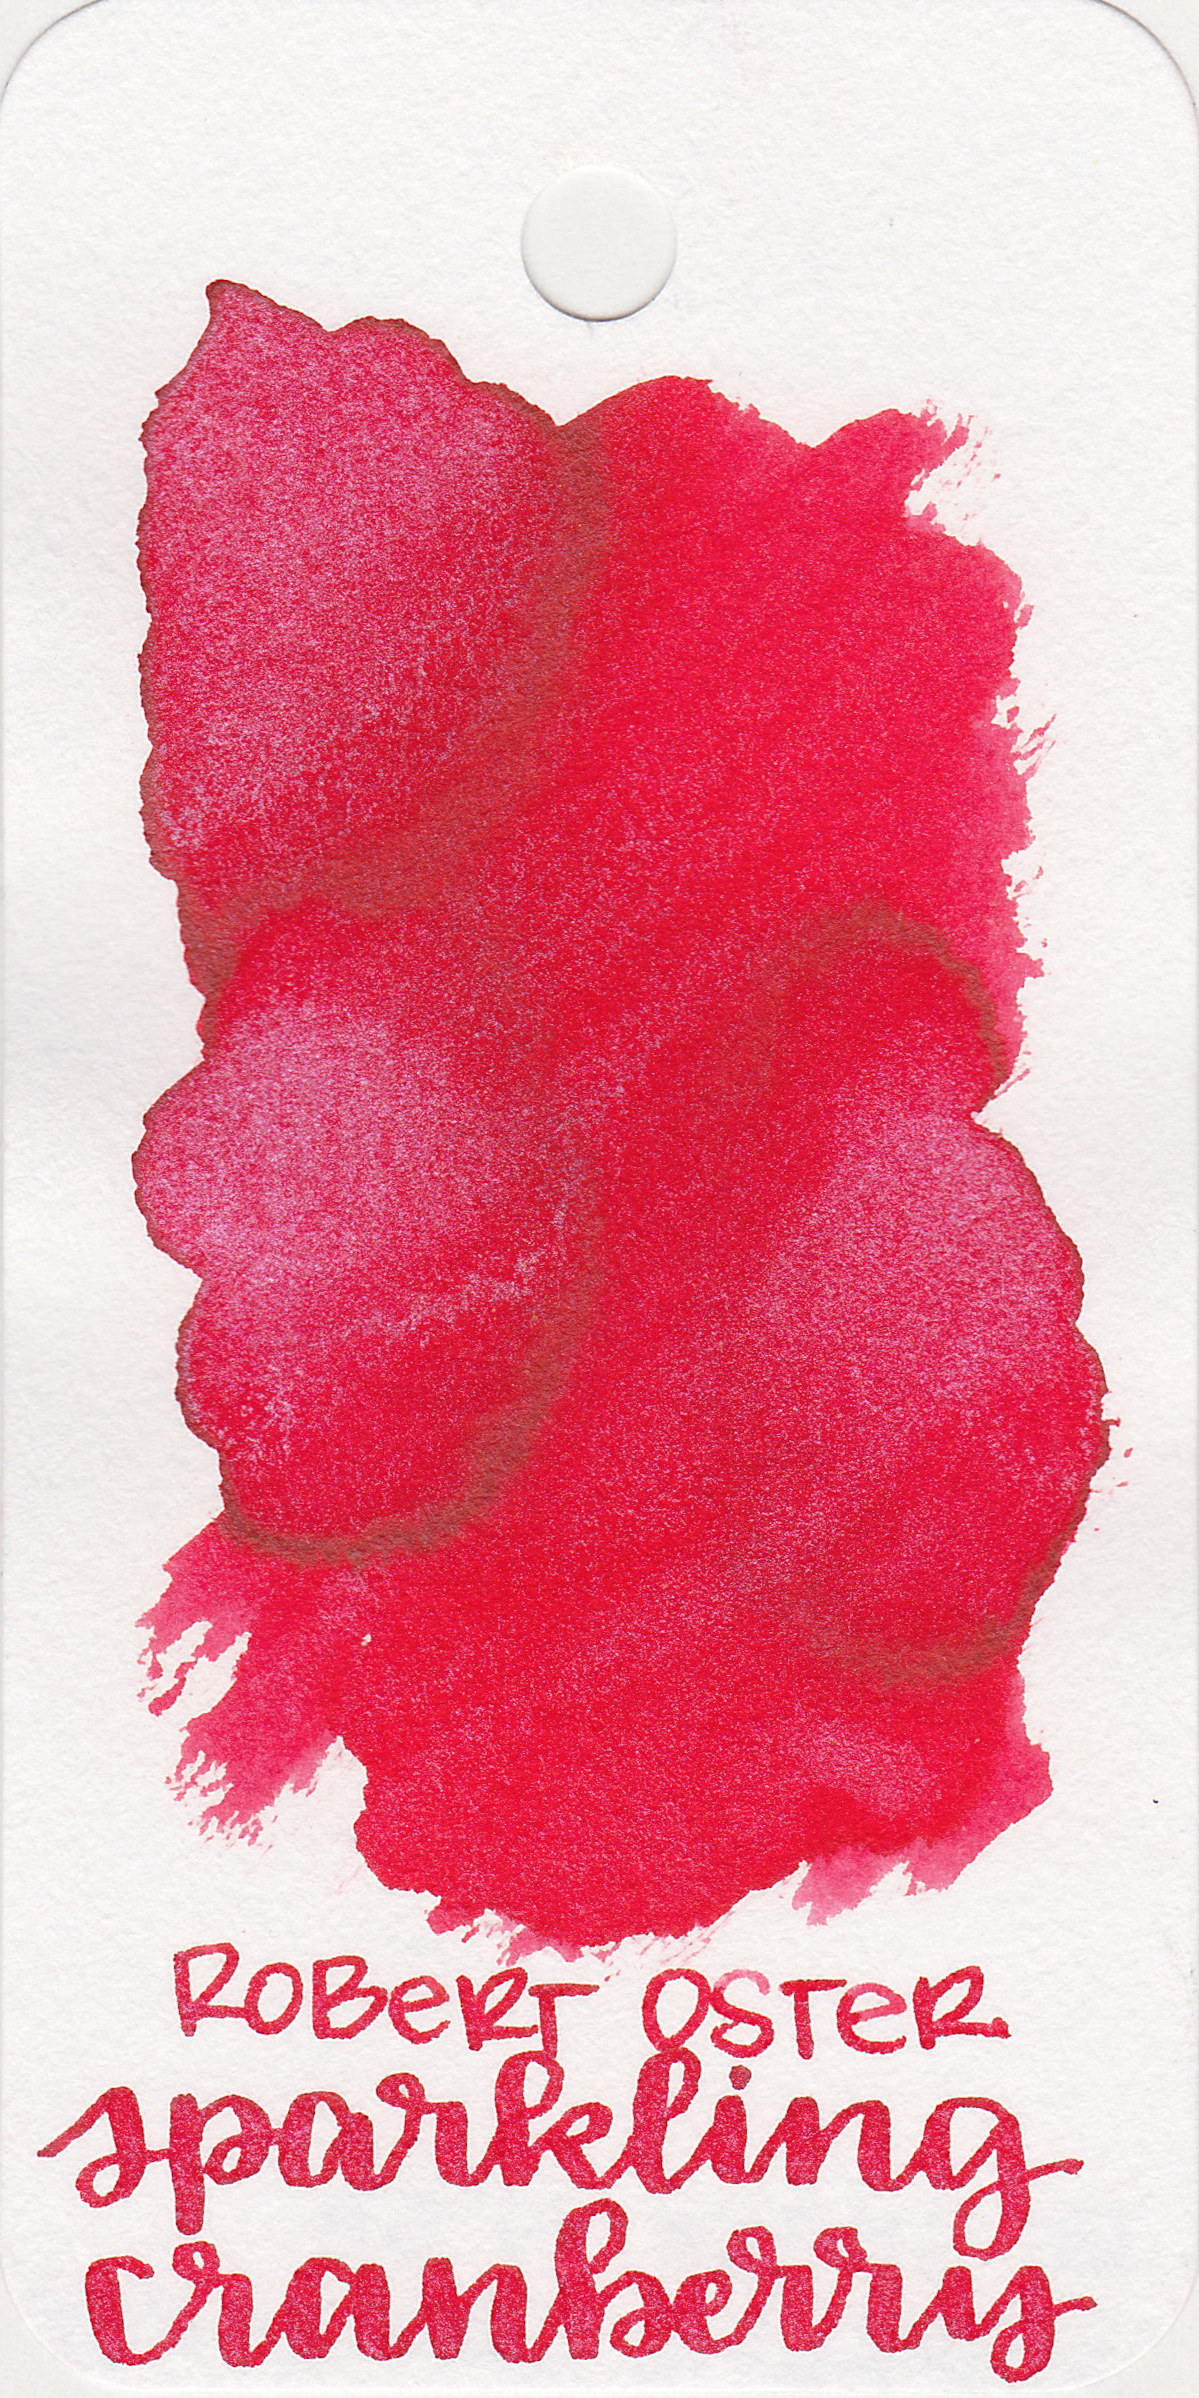 ro-sparkling-cranberry-1.jpg